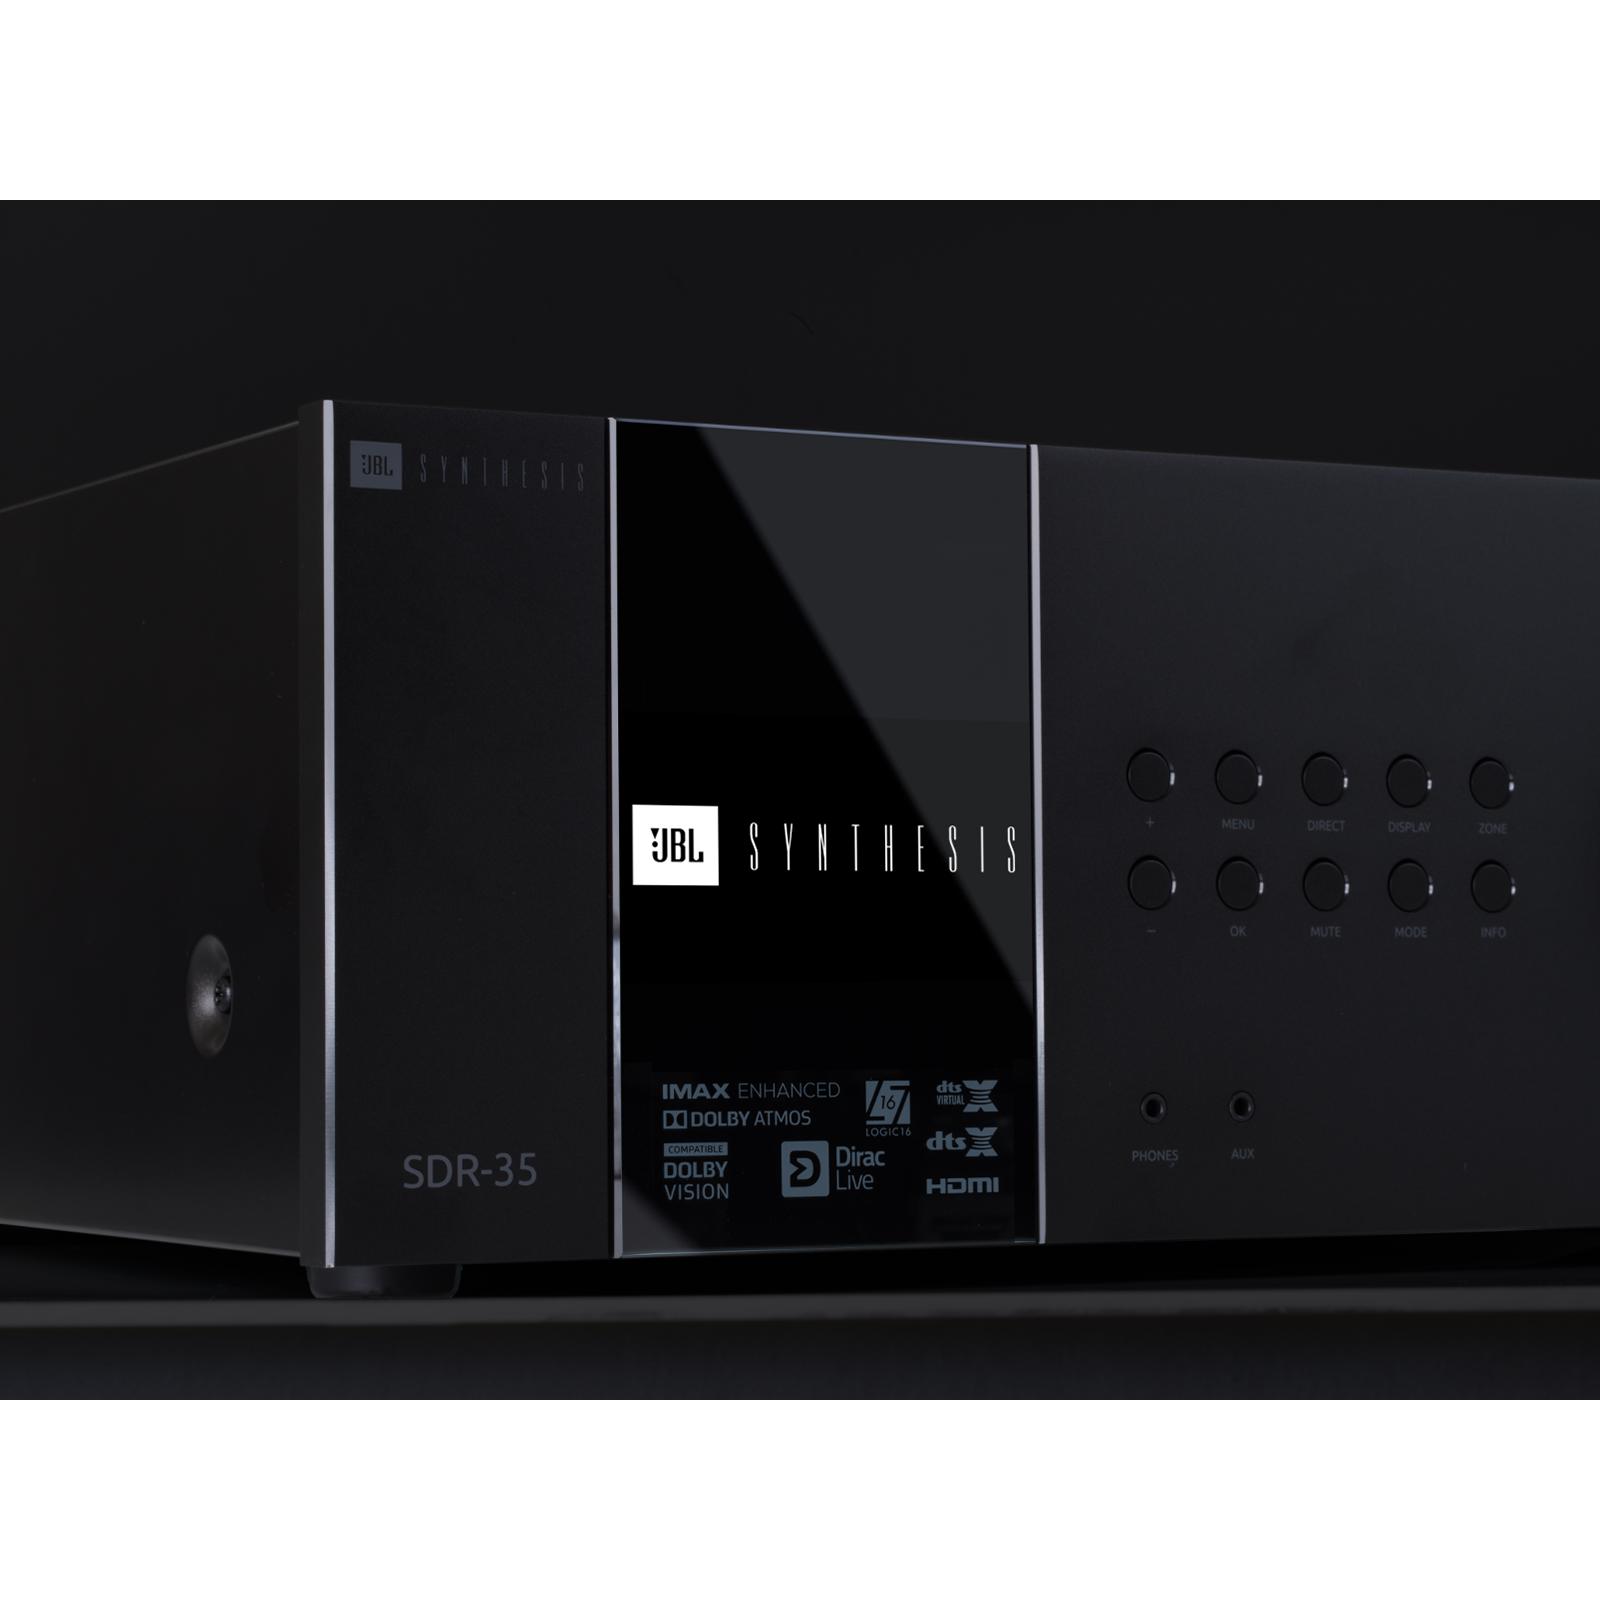 SDR-35 - Black - Class G Immersive Surround Sound AVR w/16 channels of processing - Detailshot 2